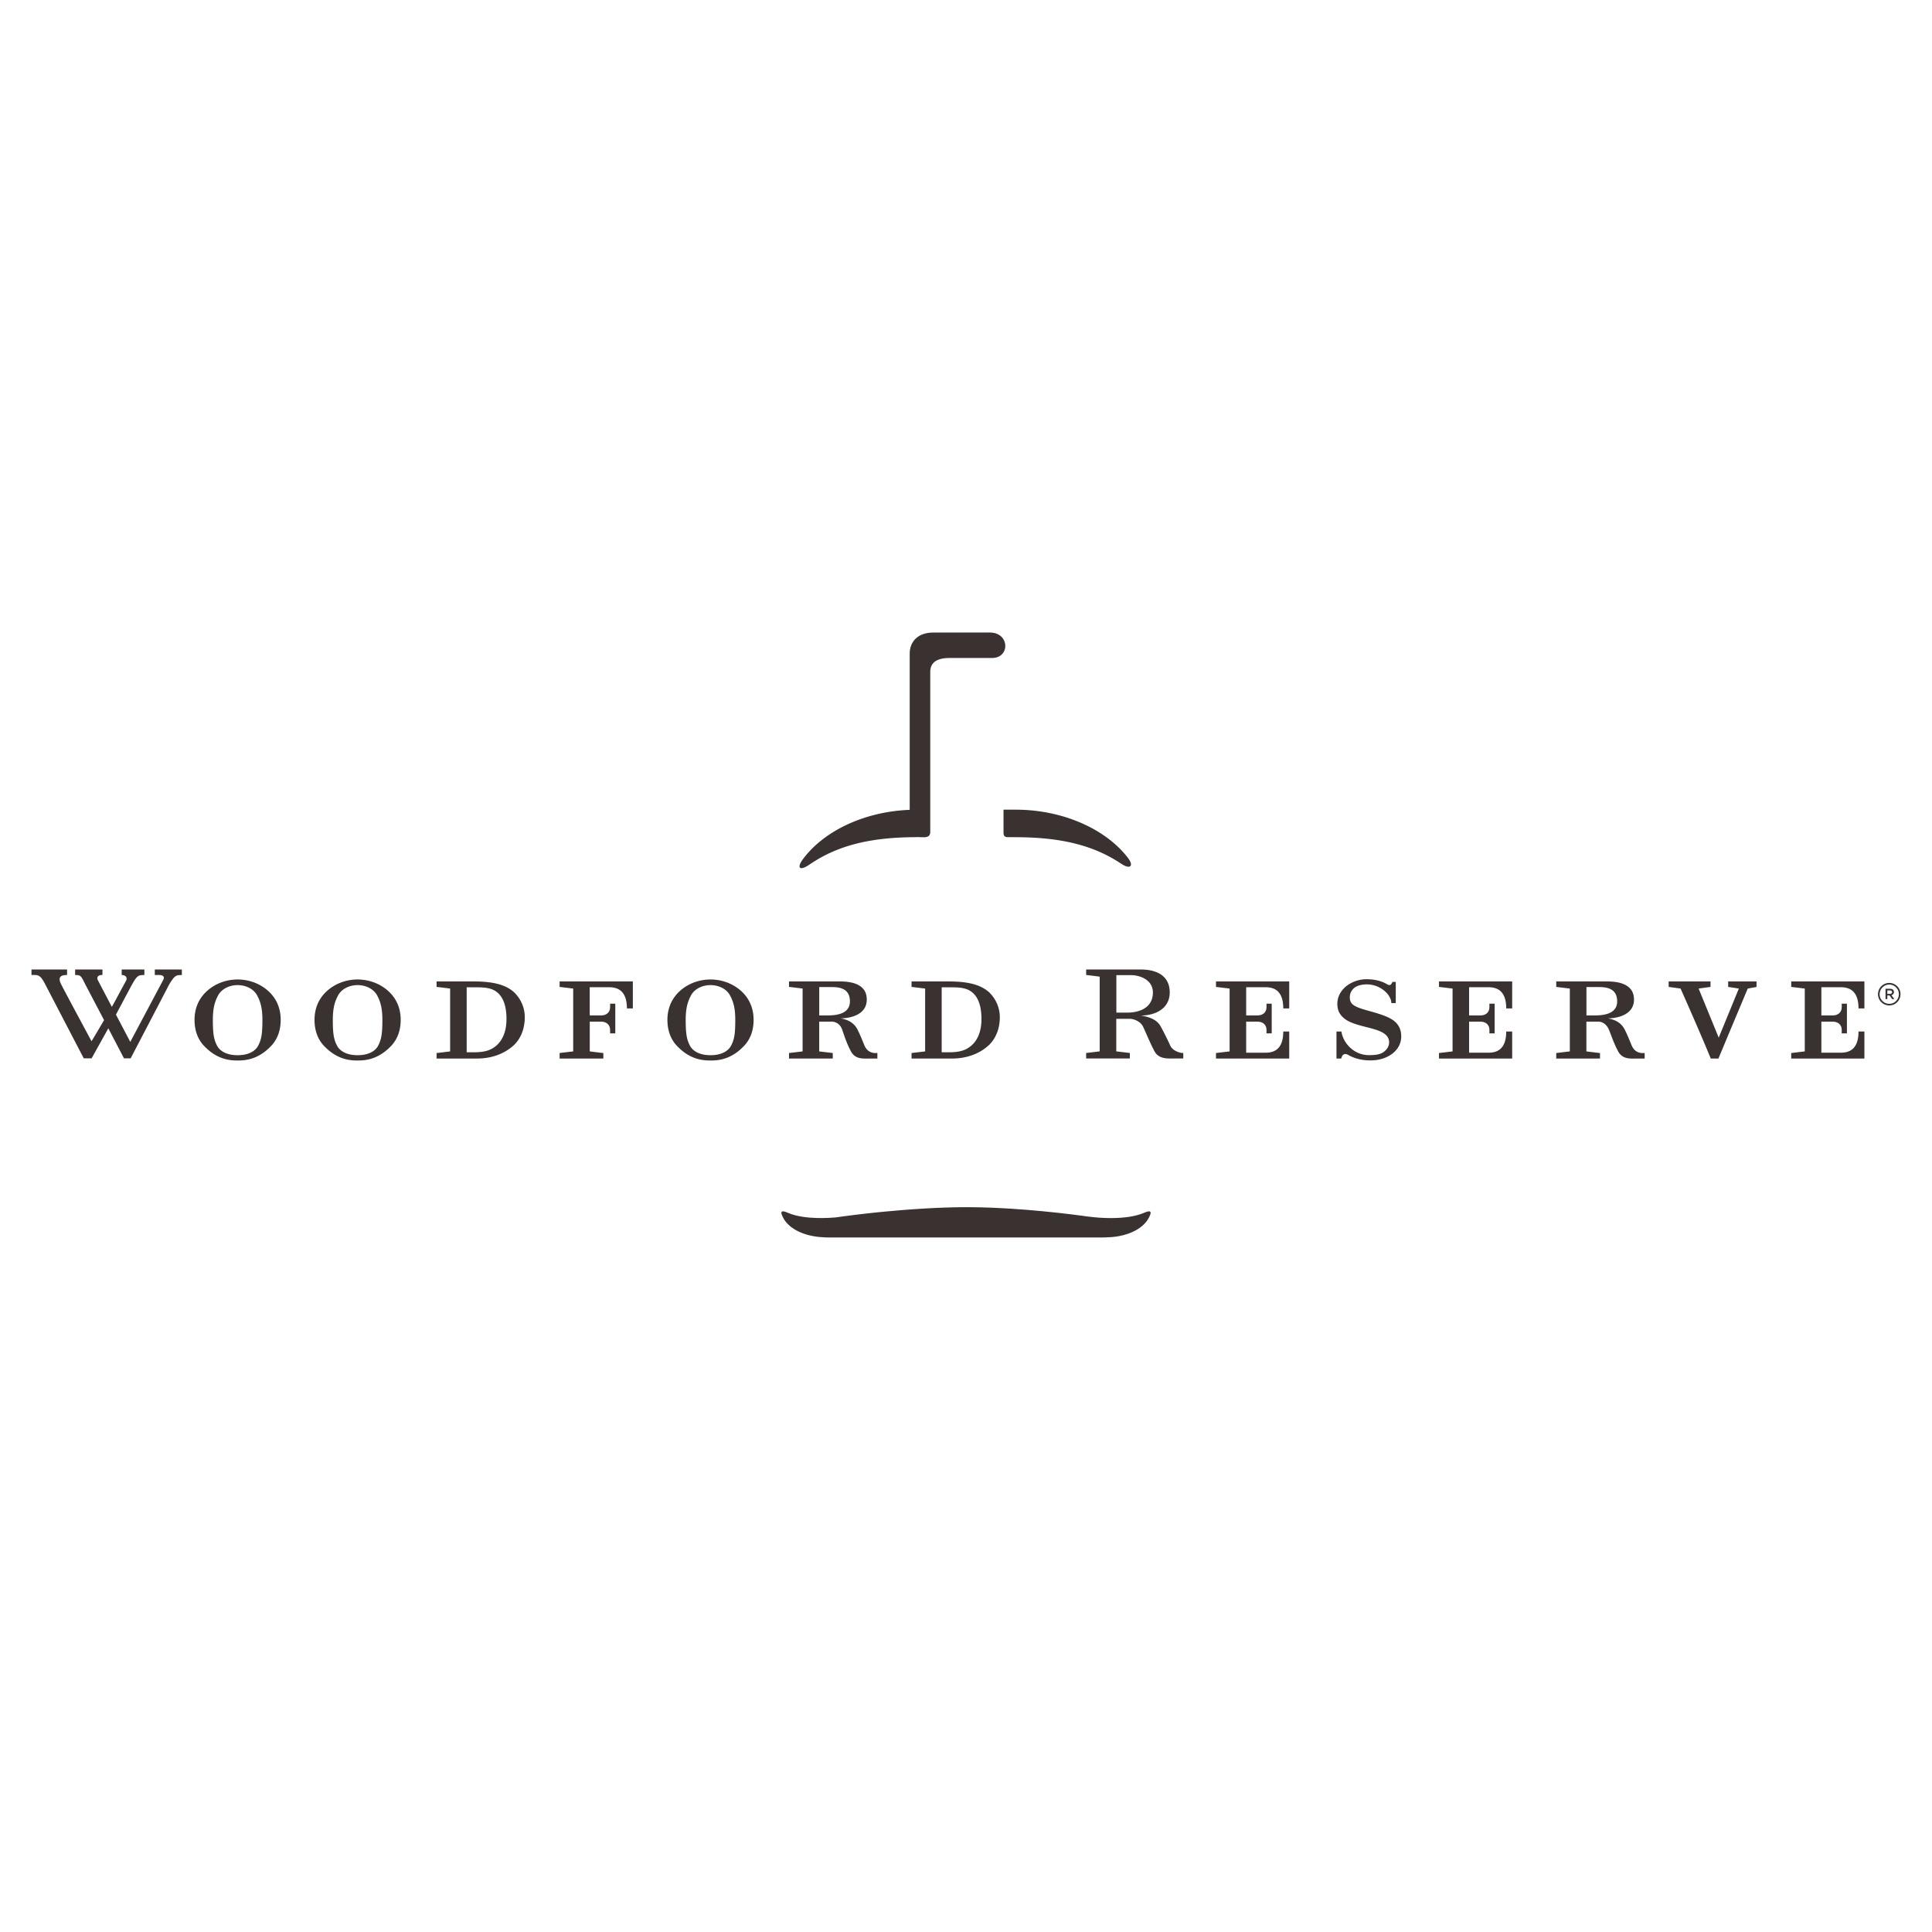 Logos - Woodford Reserve